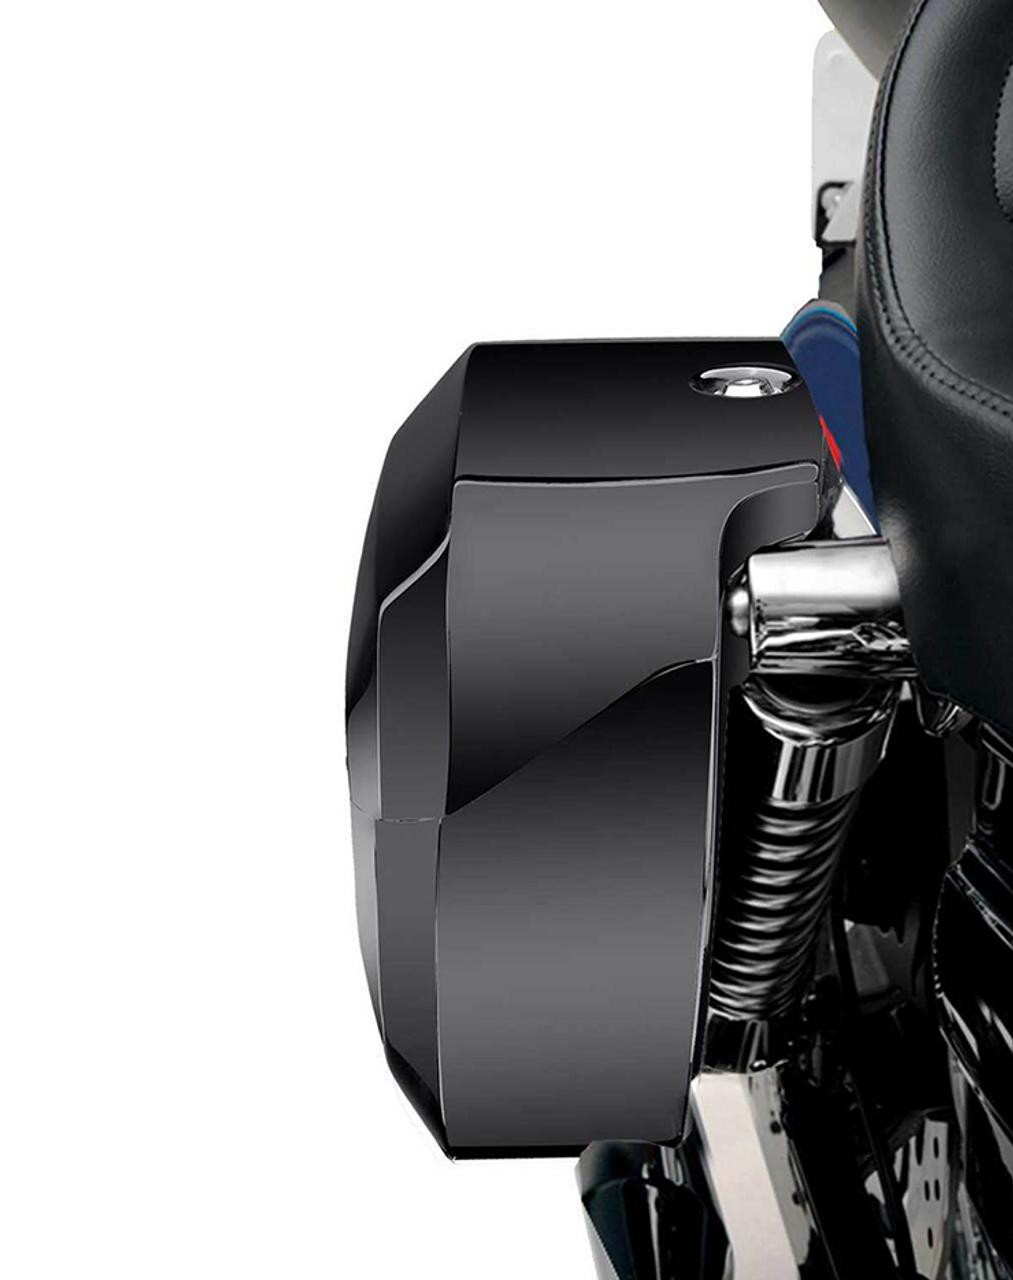 Honda 1500 Valkyrie Standard Viking Lamellar Large Spear Shock Cutout Hard Saddlebags Shock Cutout View